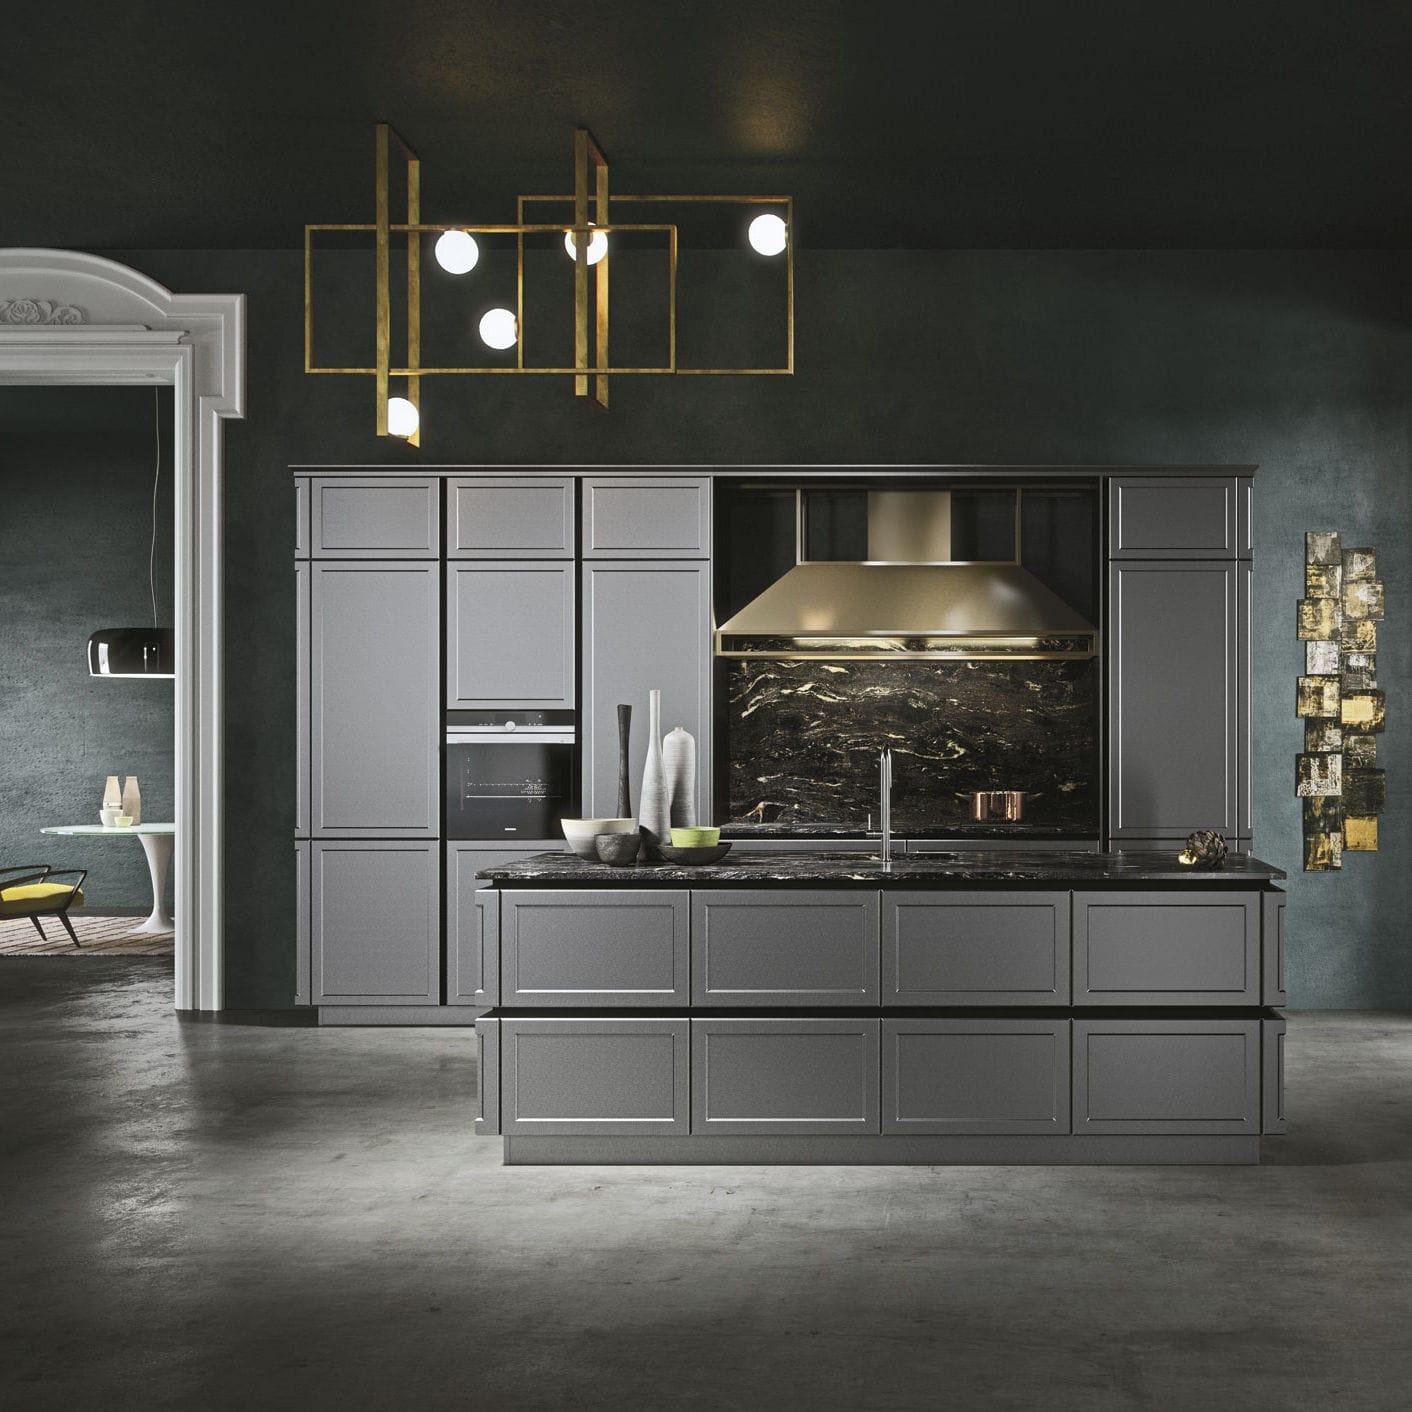 Klassische Küche / Holz / Modul / Kochinsel FRAME by Iosa Ghini Design  SNAIDERO RINO SPA